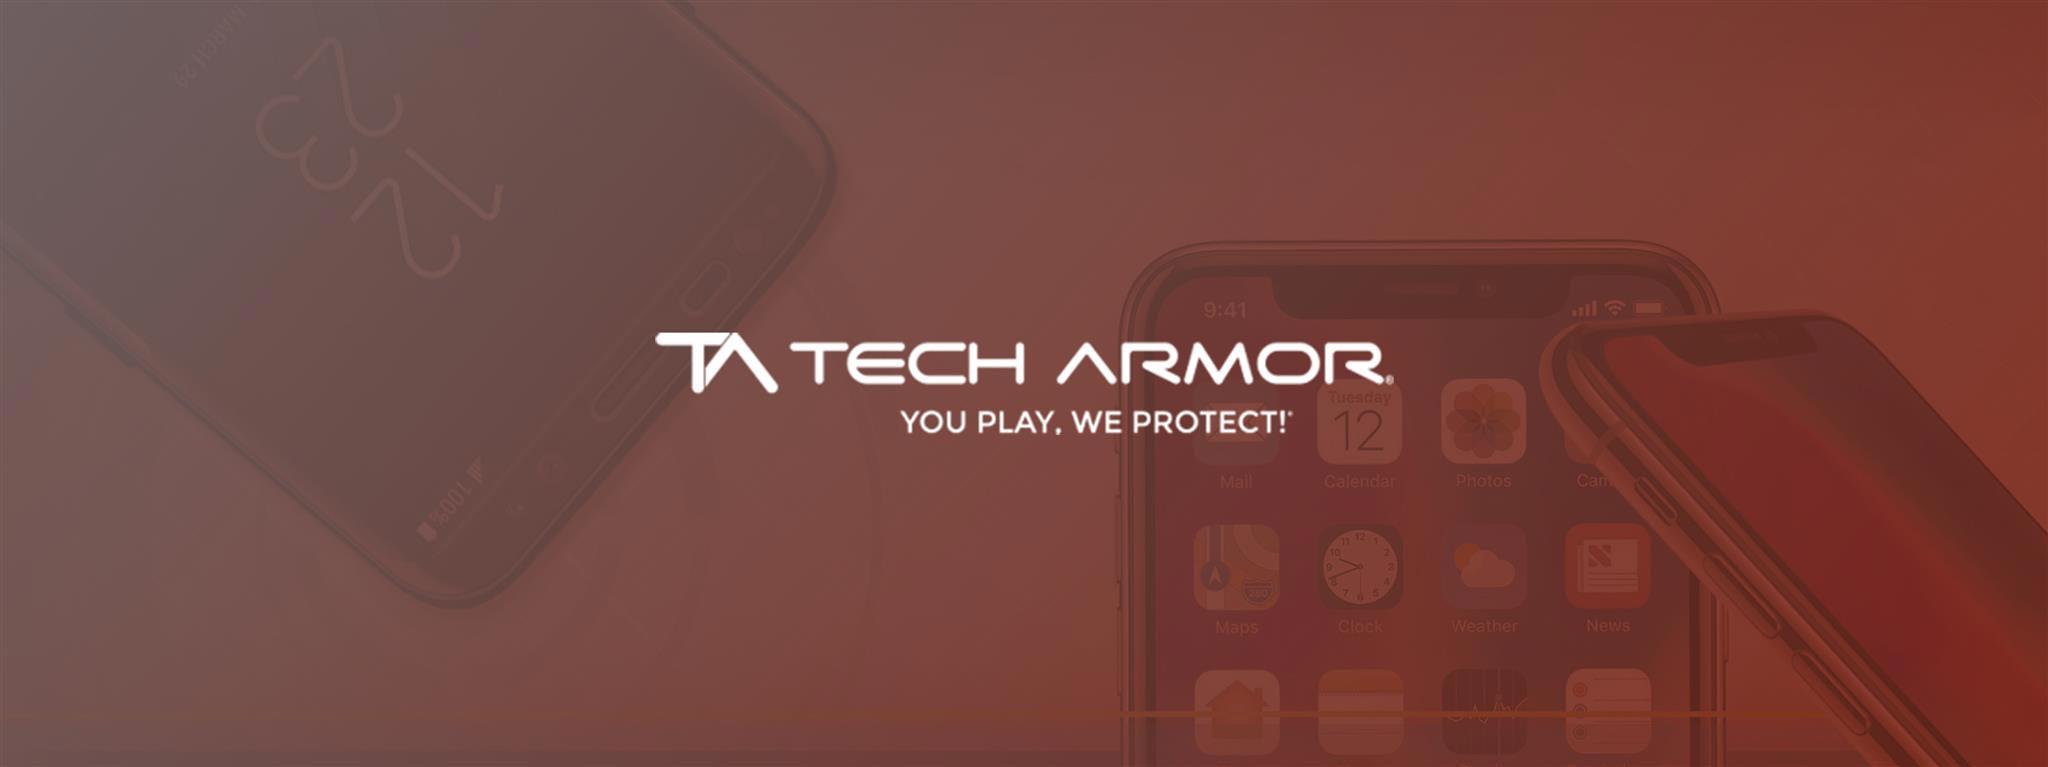 TechArmor_CaseStudy_1-min